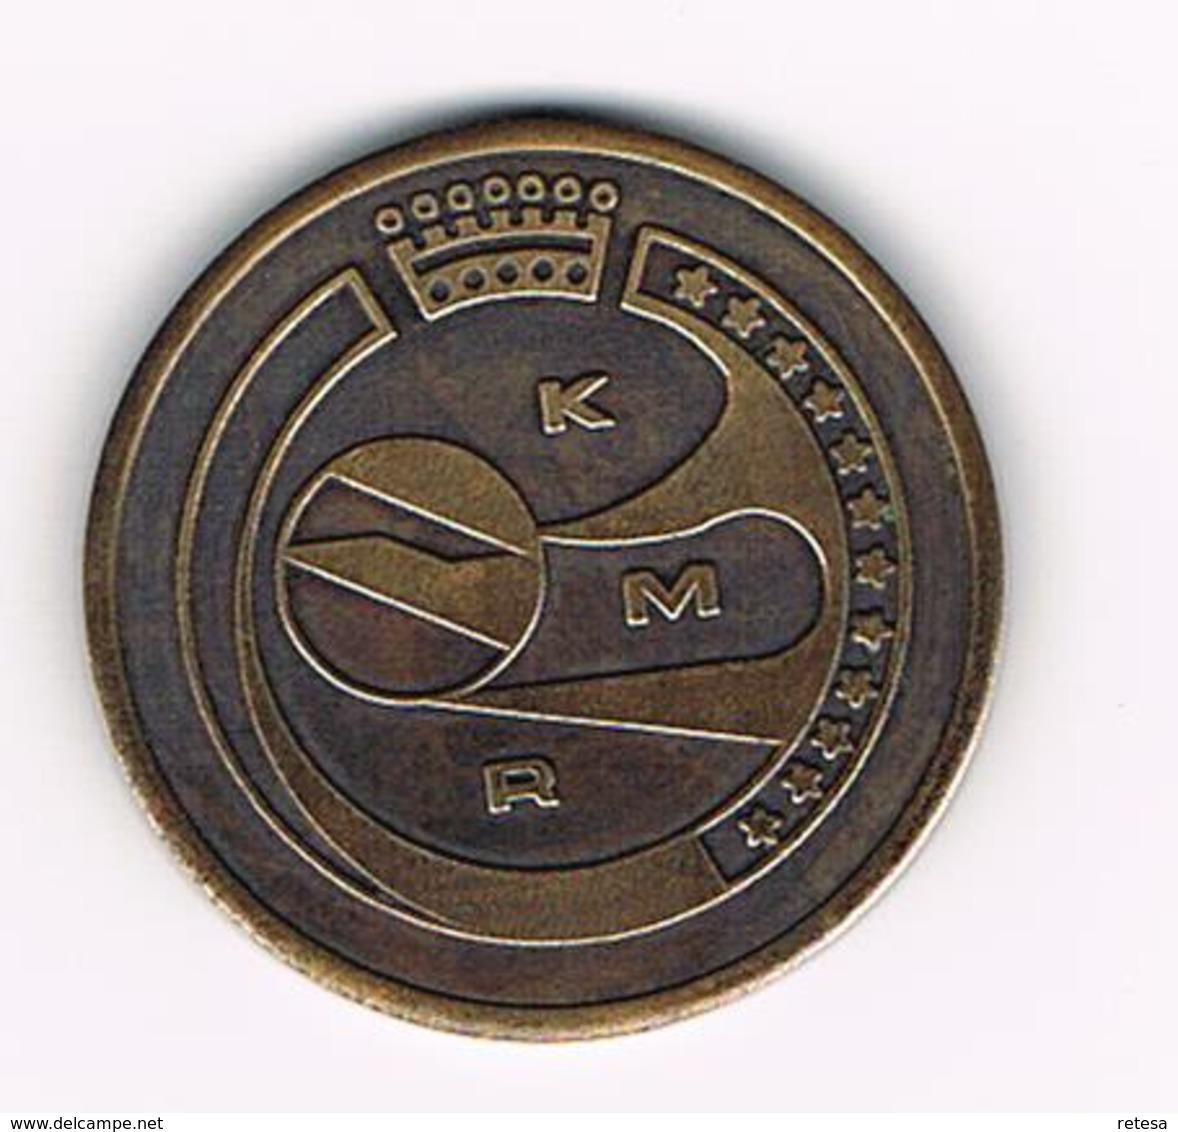 //  GEDENKINGSPENNING  KMR  12 STERREN - Pièces écrasées (Elongated Coins)